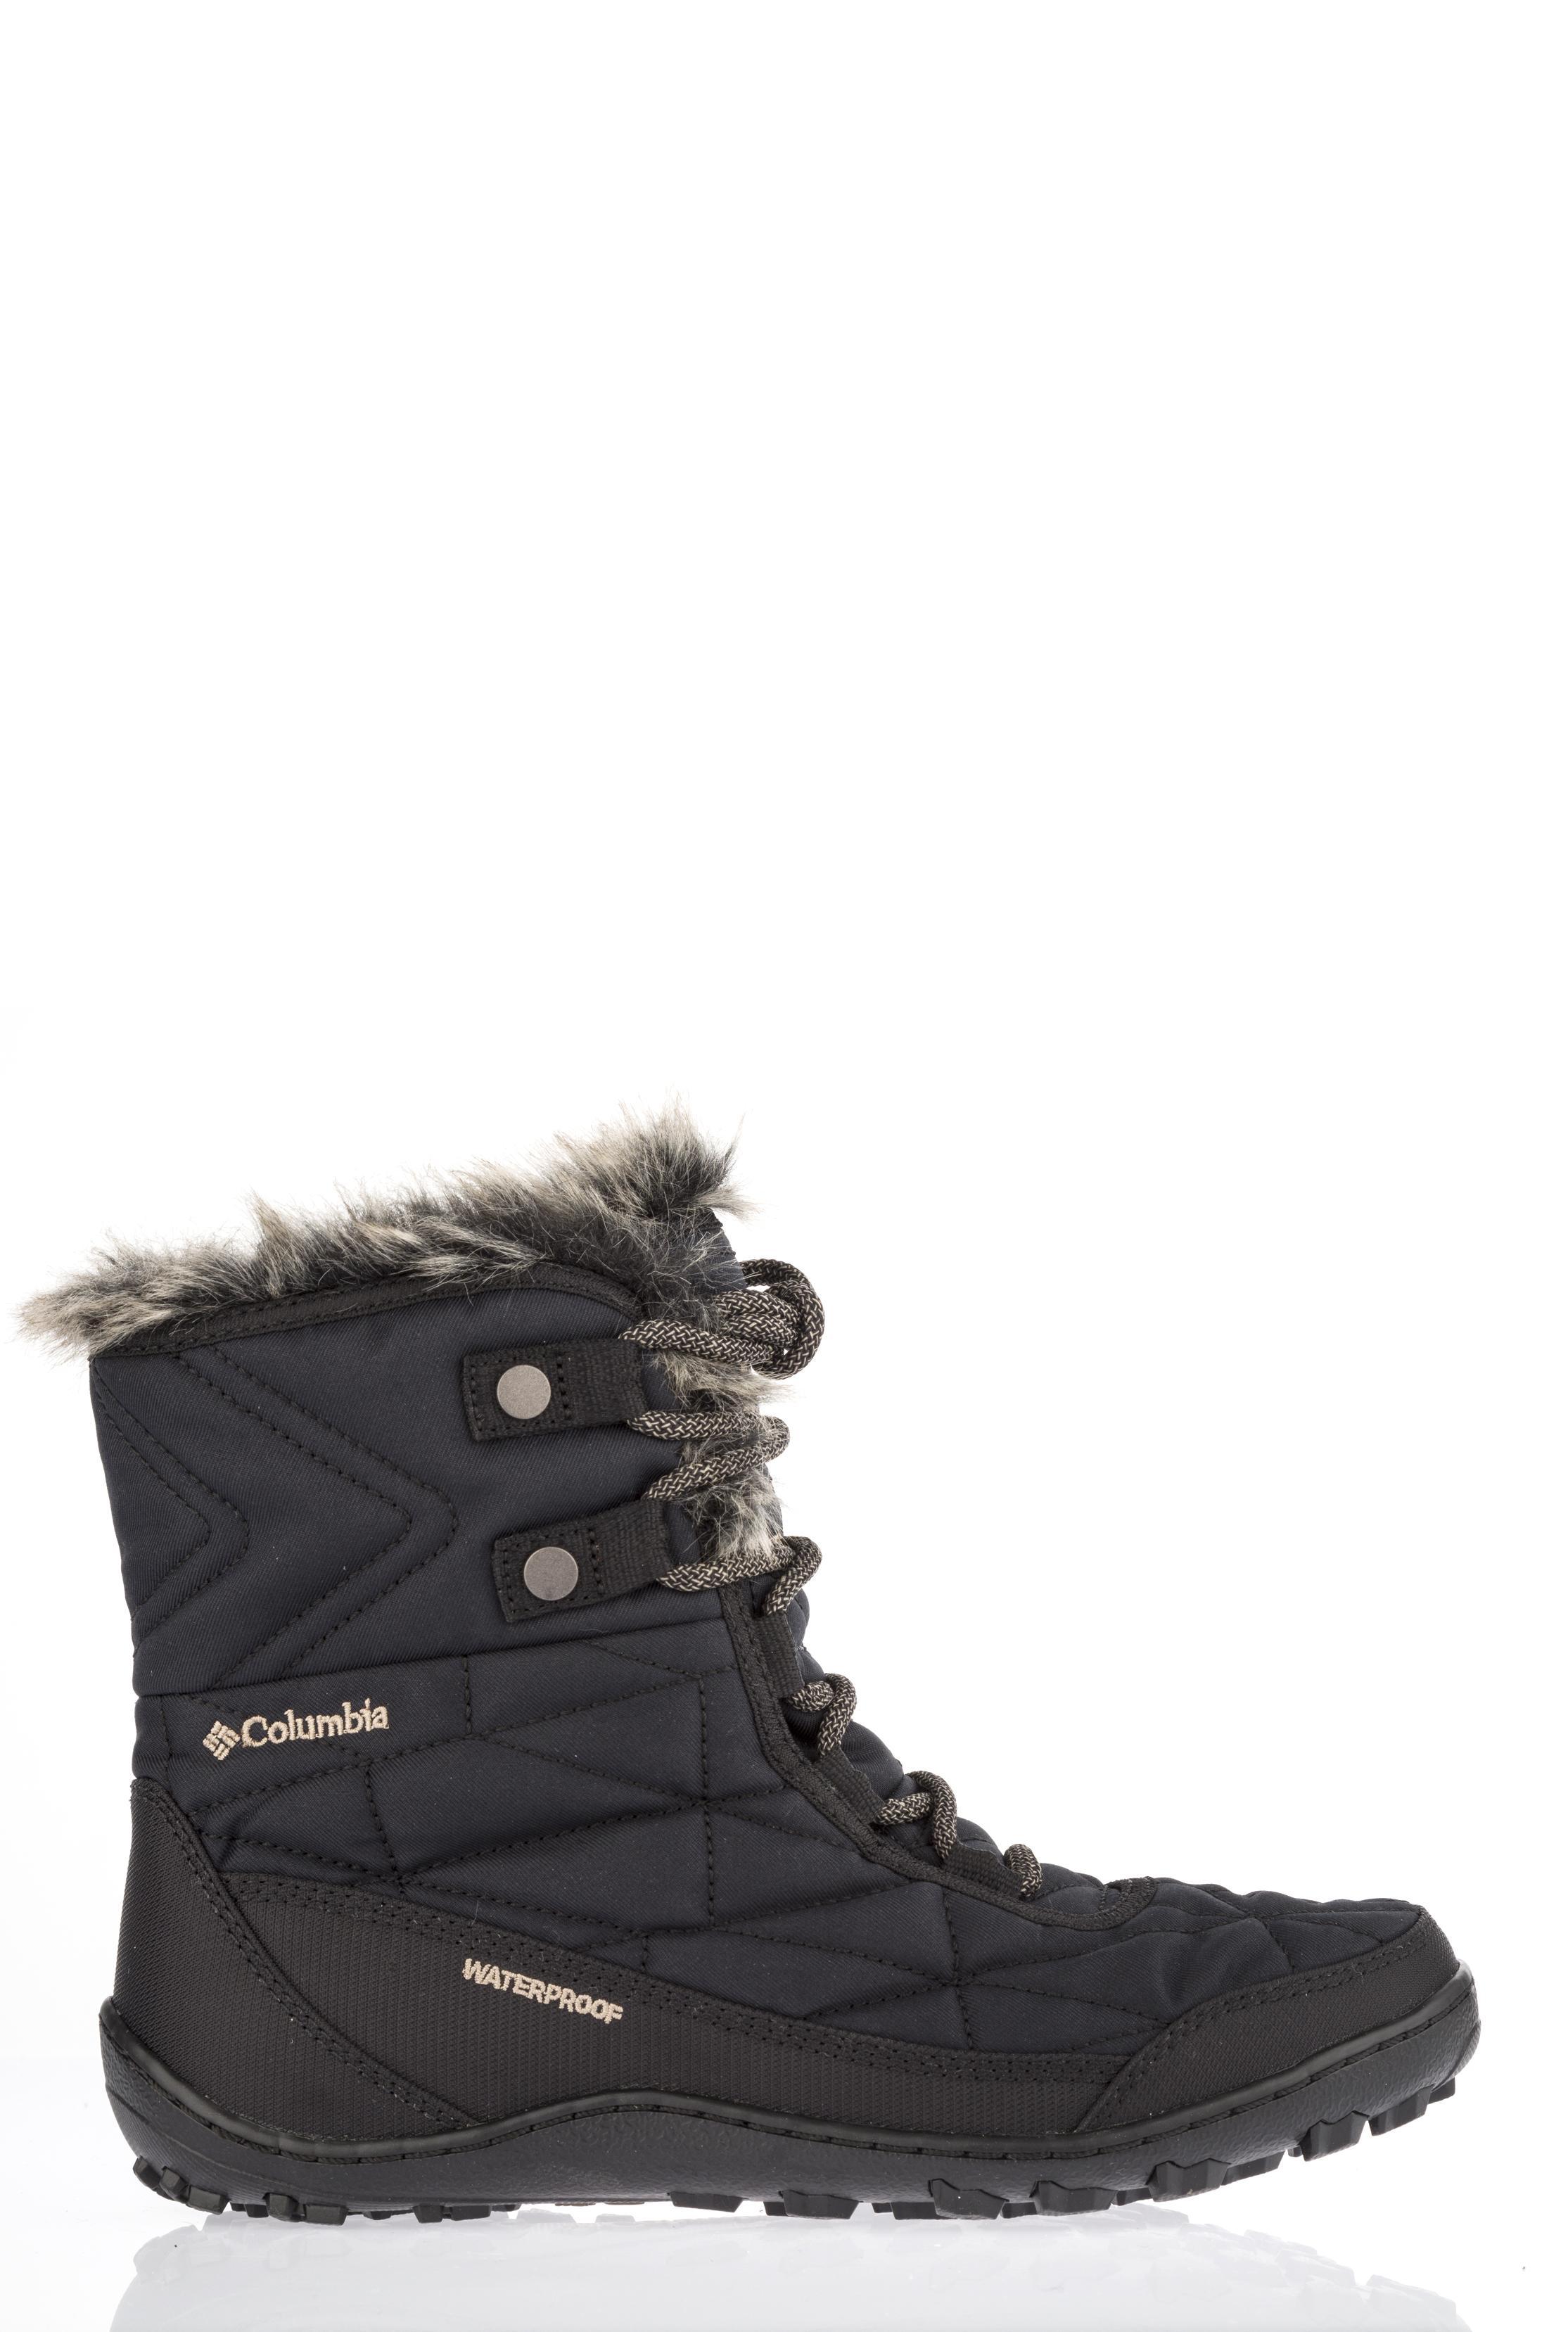 Columbia Minx? Shorty III Winter Boots